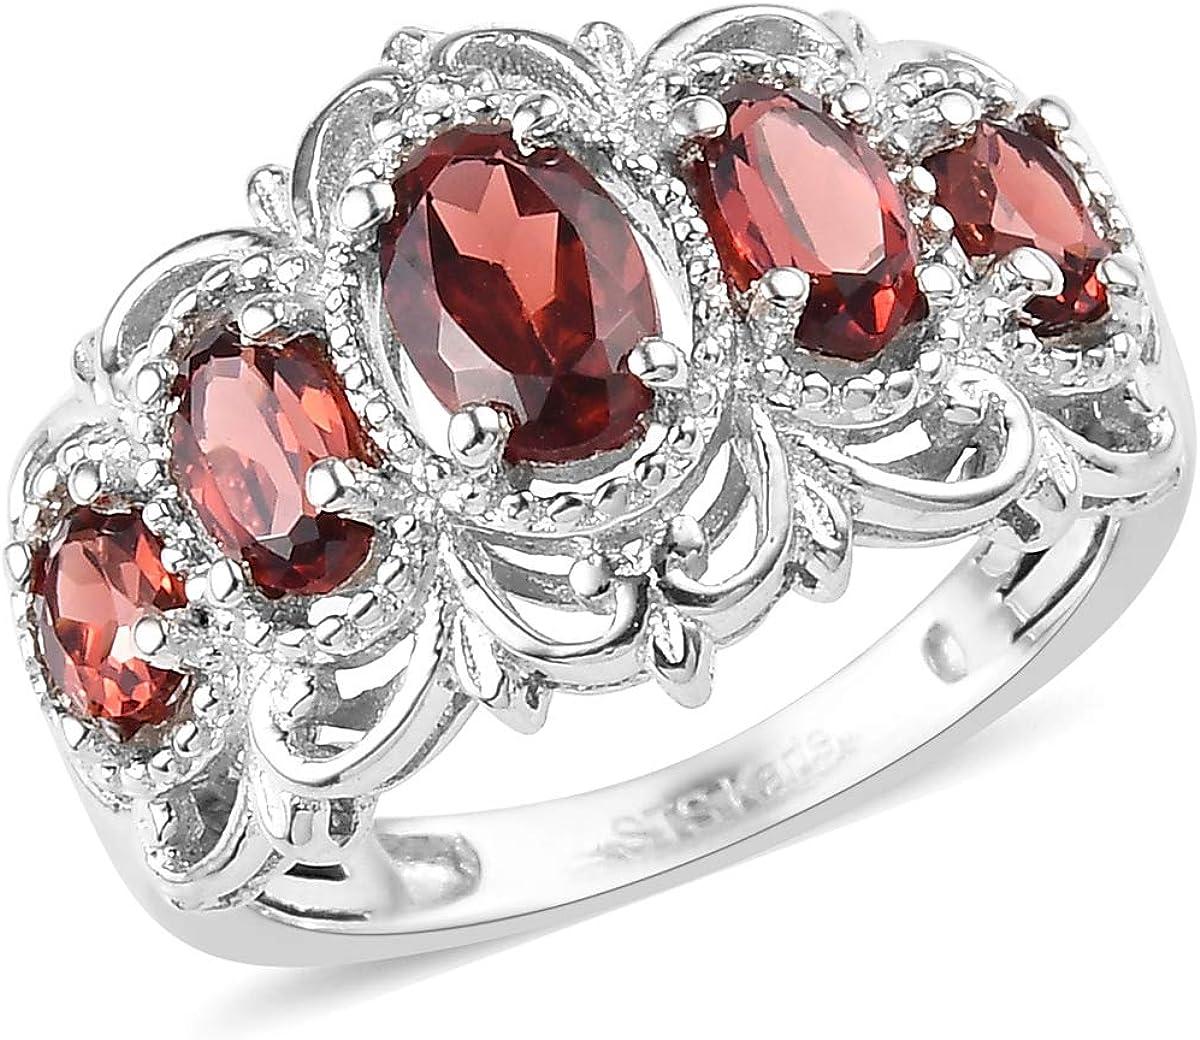 Shop LC Delivering Joy Platinum Oval Garnet 5 Stone Triquetra Celtic Knot Victorian Statement Ring Fashion Jewelry Ct 1.2